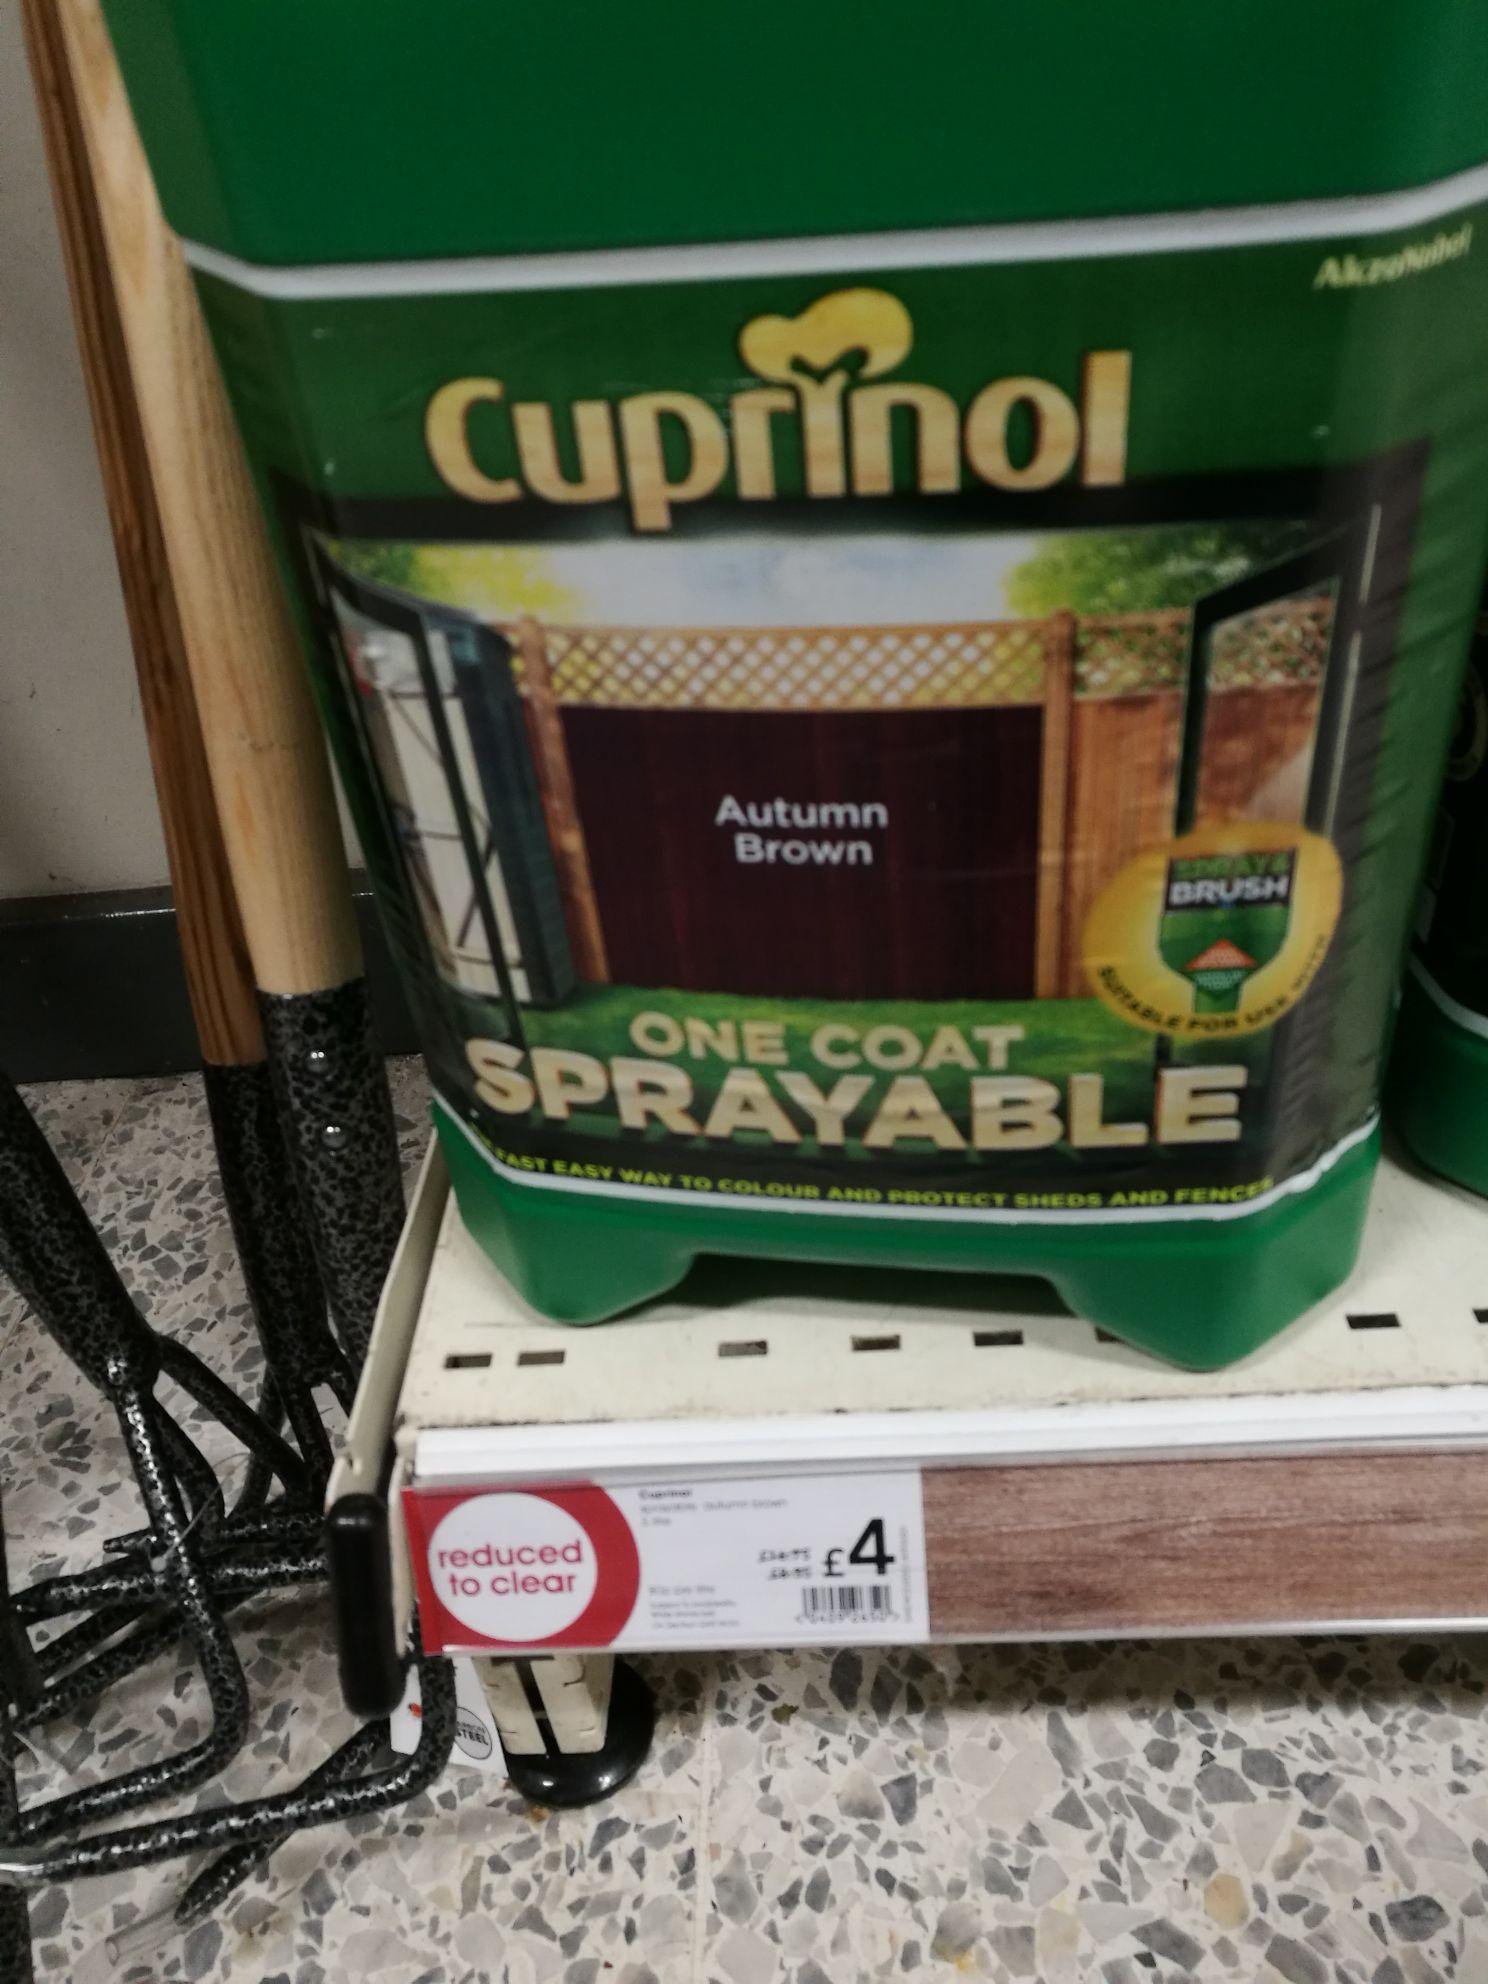 Cuprinol One Coat Sprayable Autumn Brown - £4 at Wilkos In-store Only